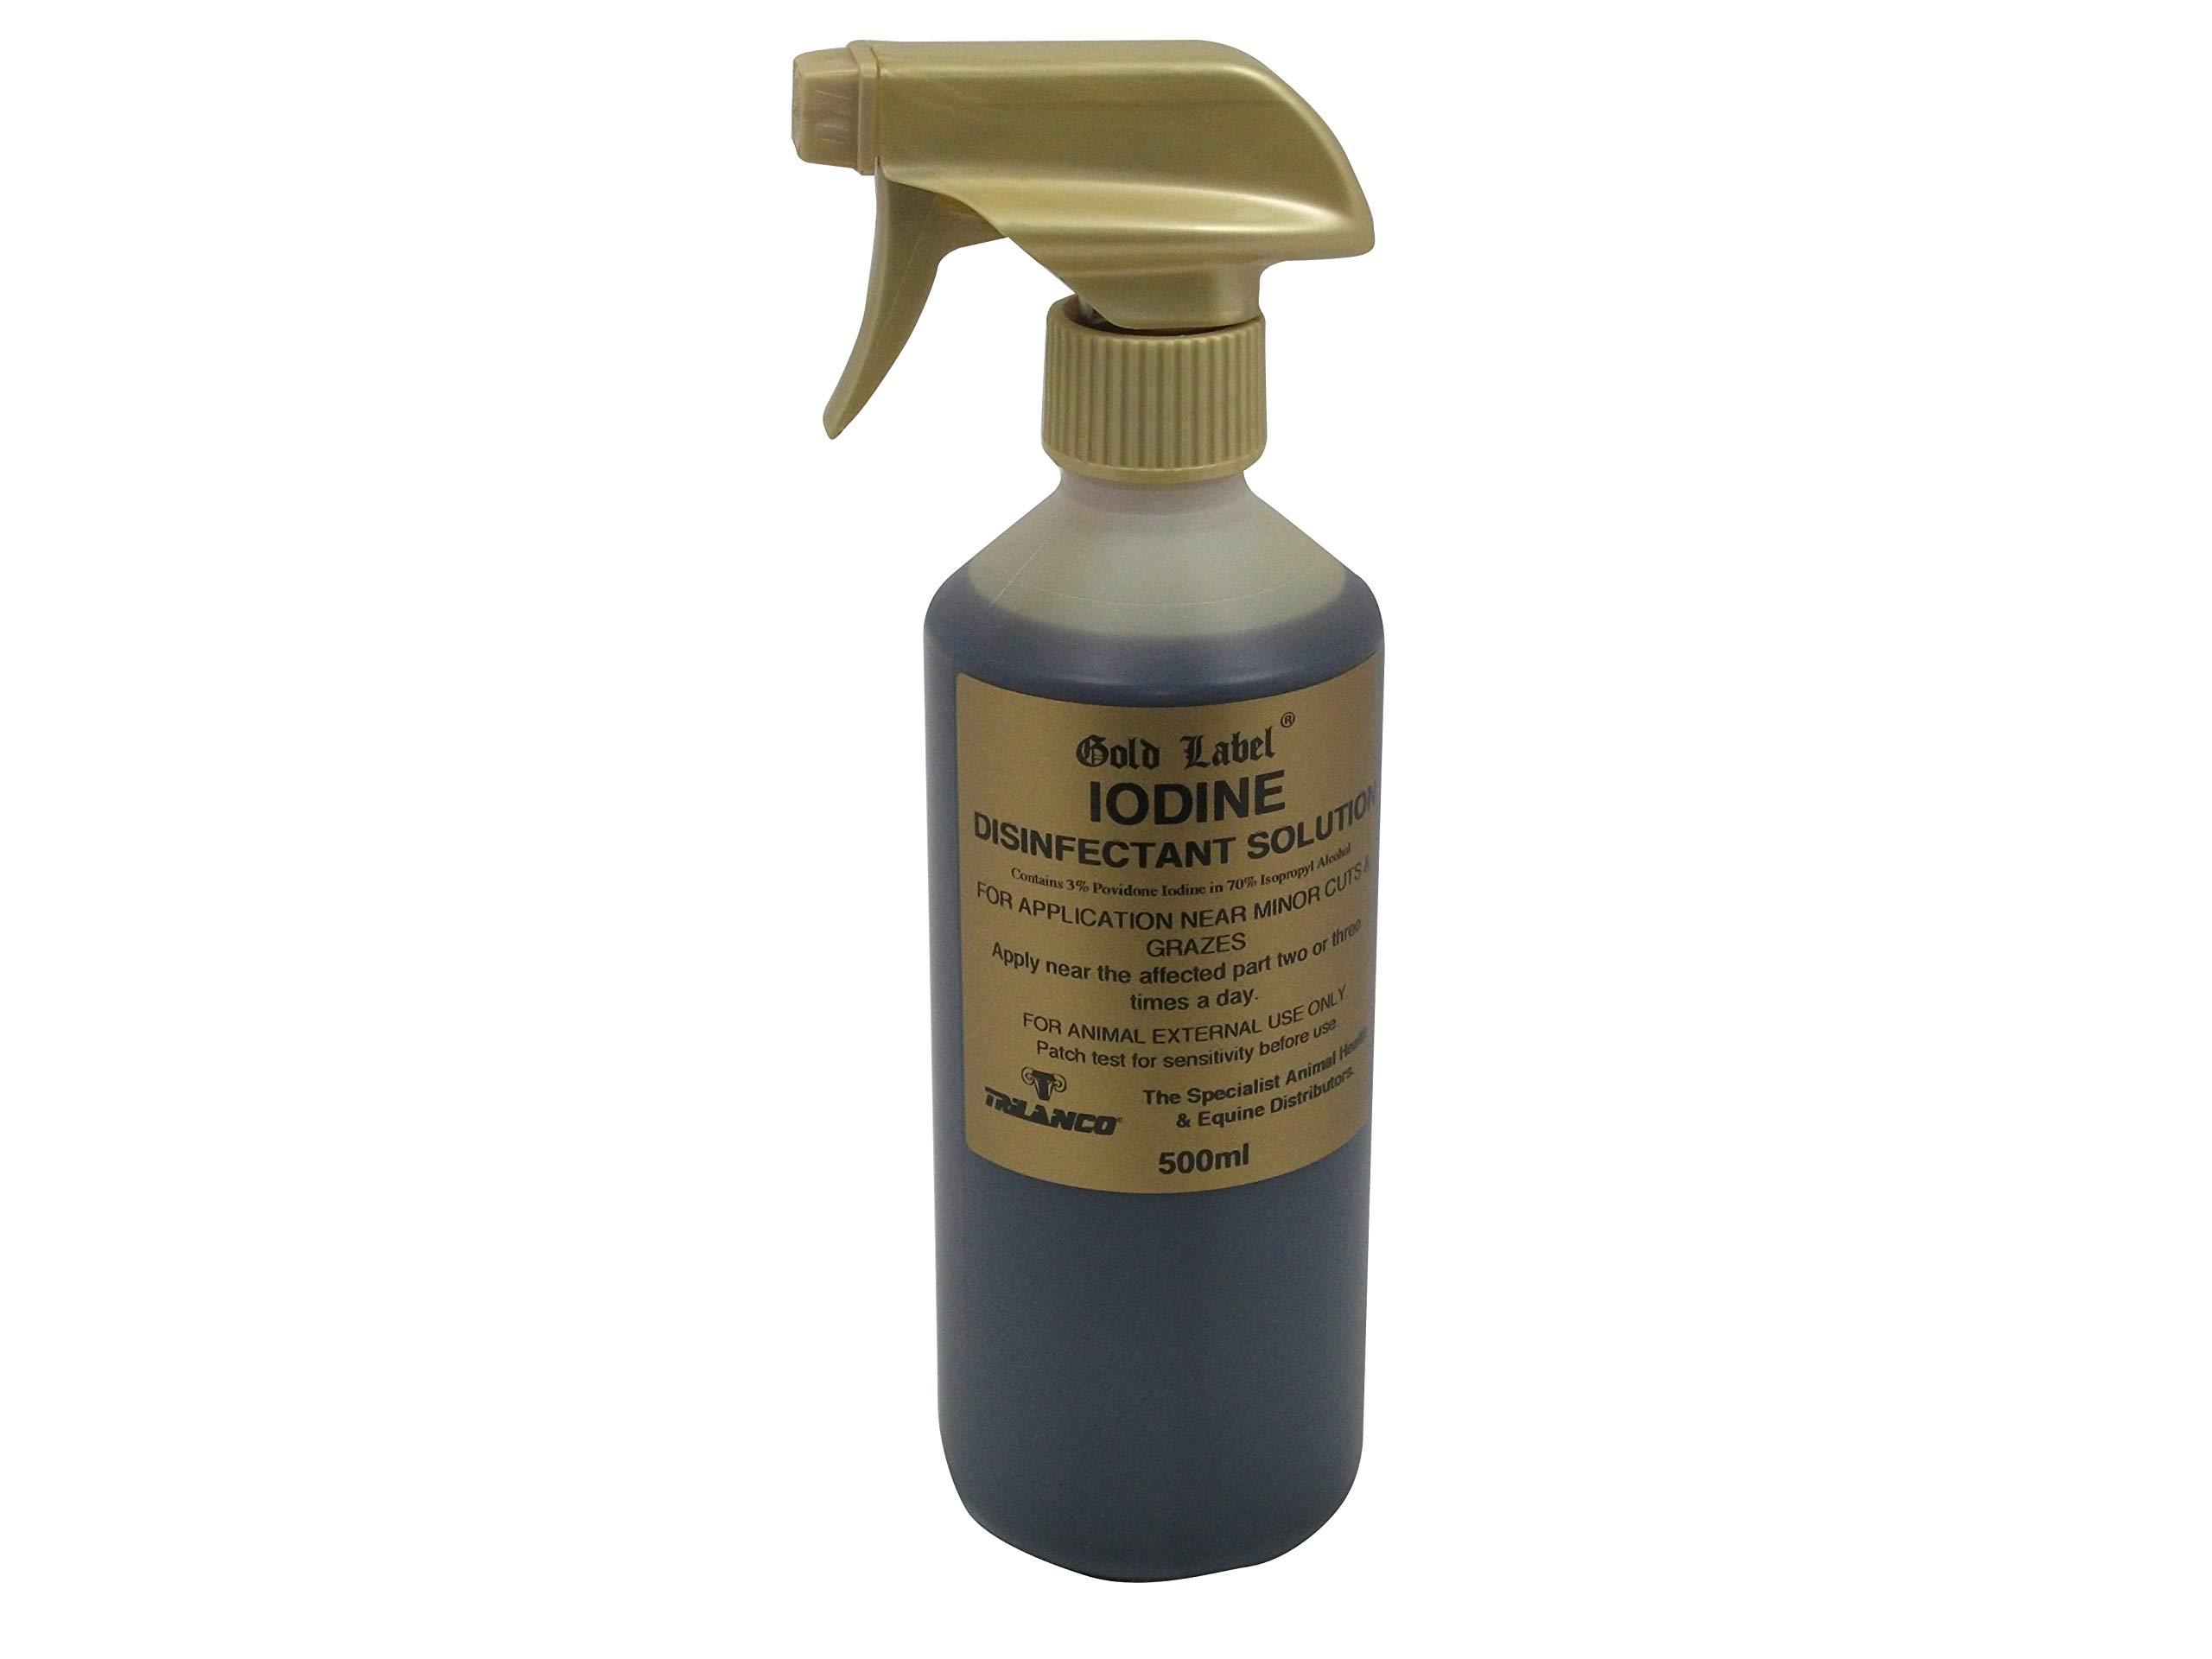 Gold Label Signature Iodine Spray - 500 Ml - Clear, Unisex